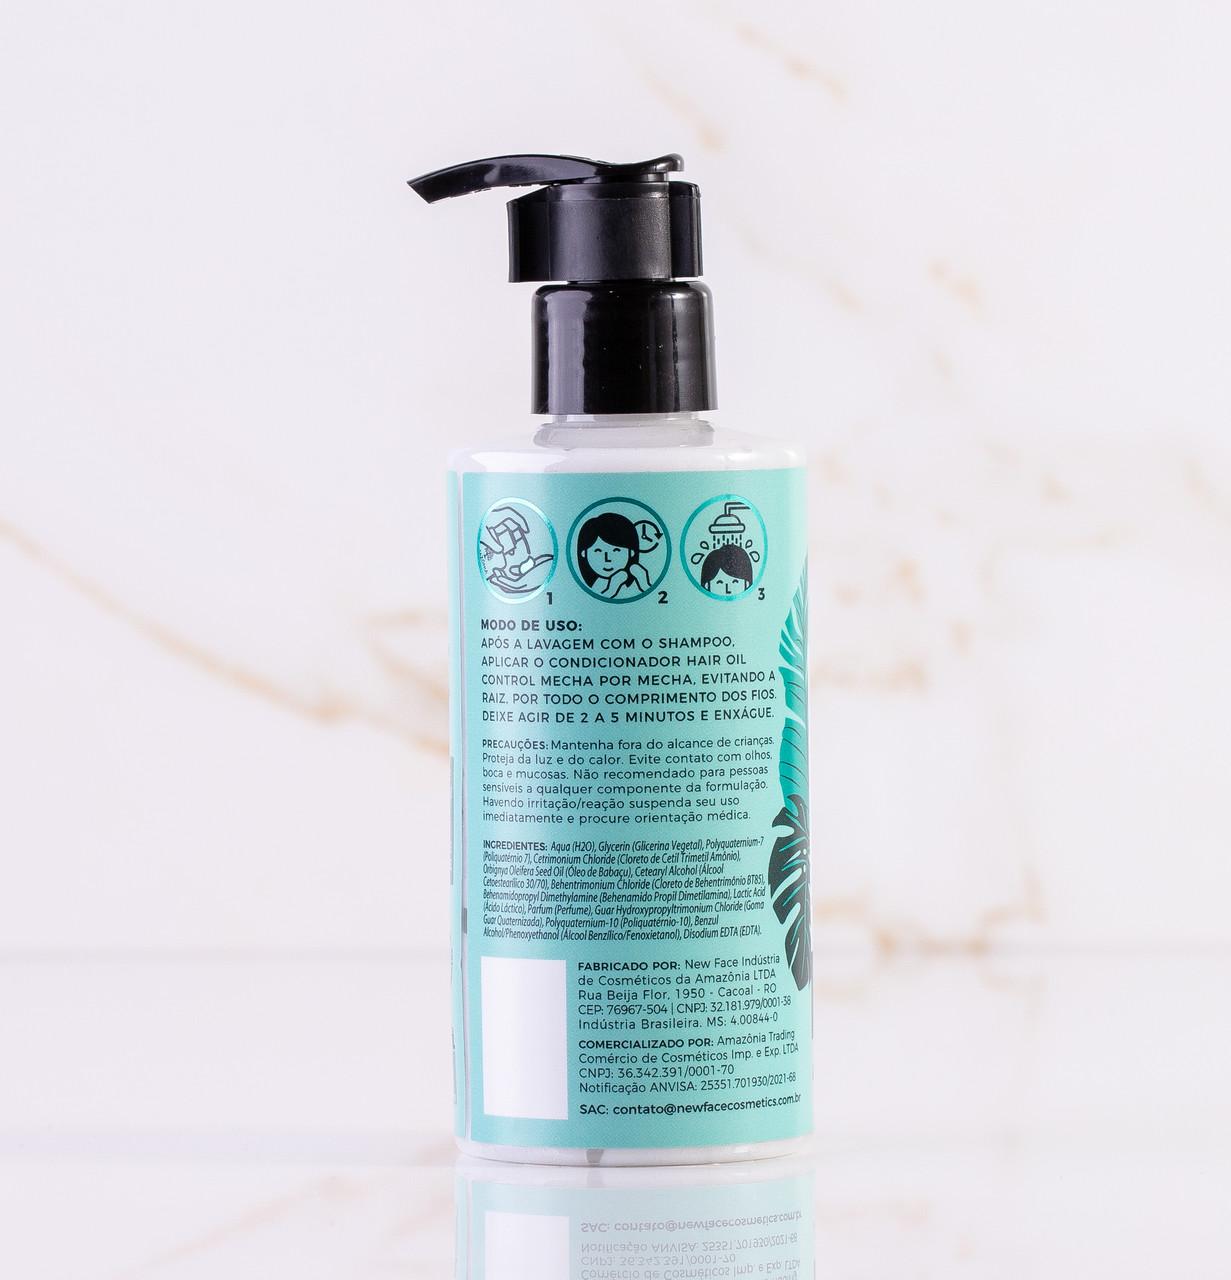 Kit Hair Oil Control